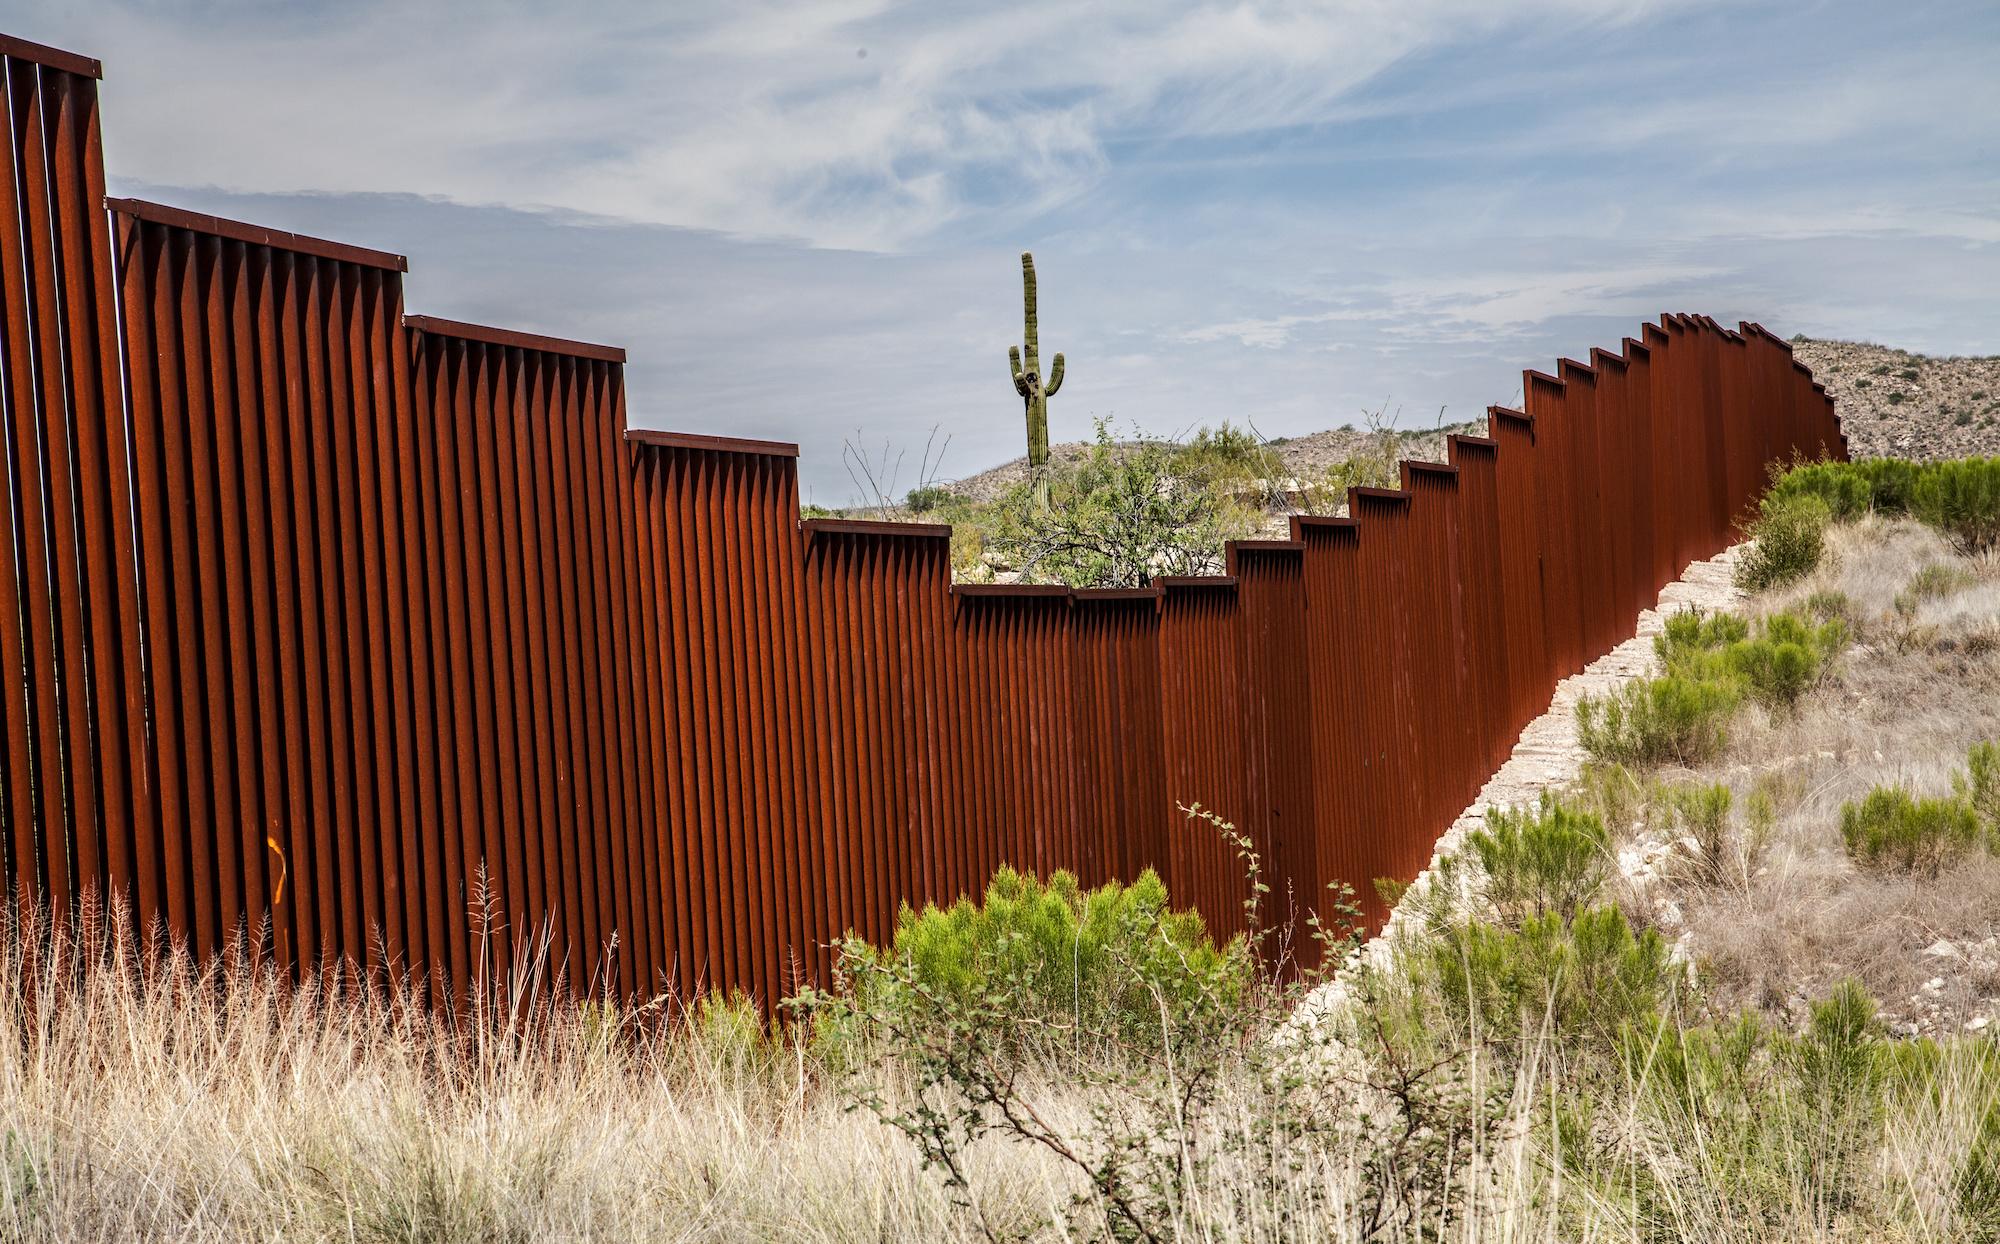 US-Mexican border in Arizona, USA